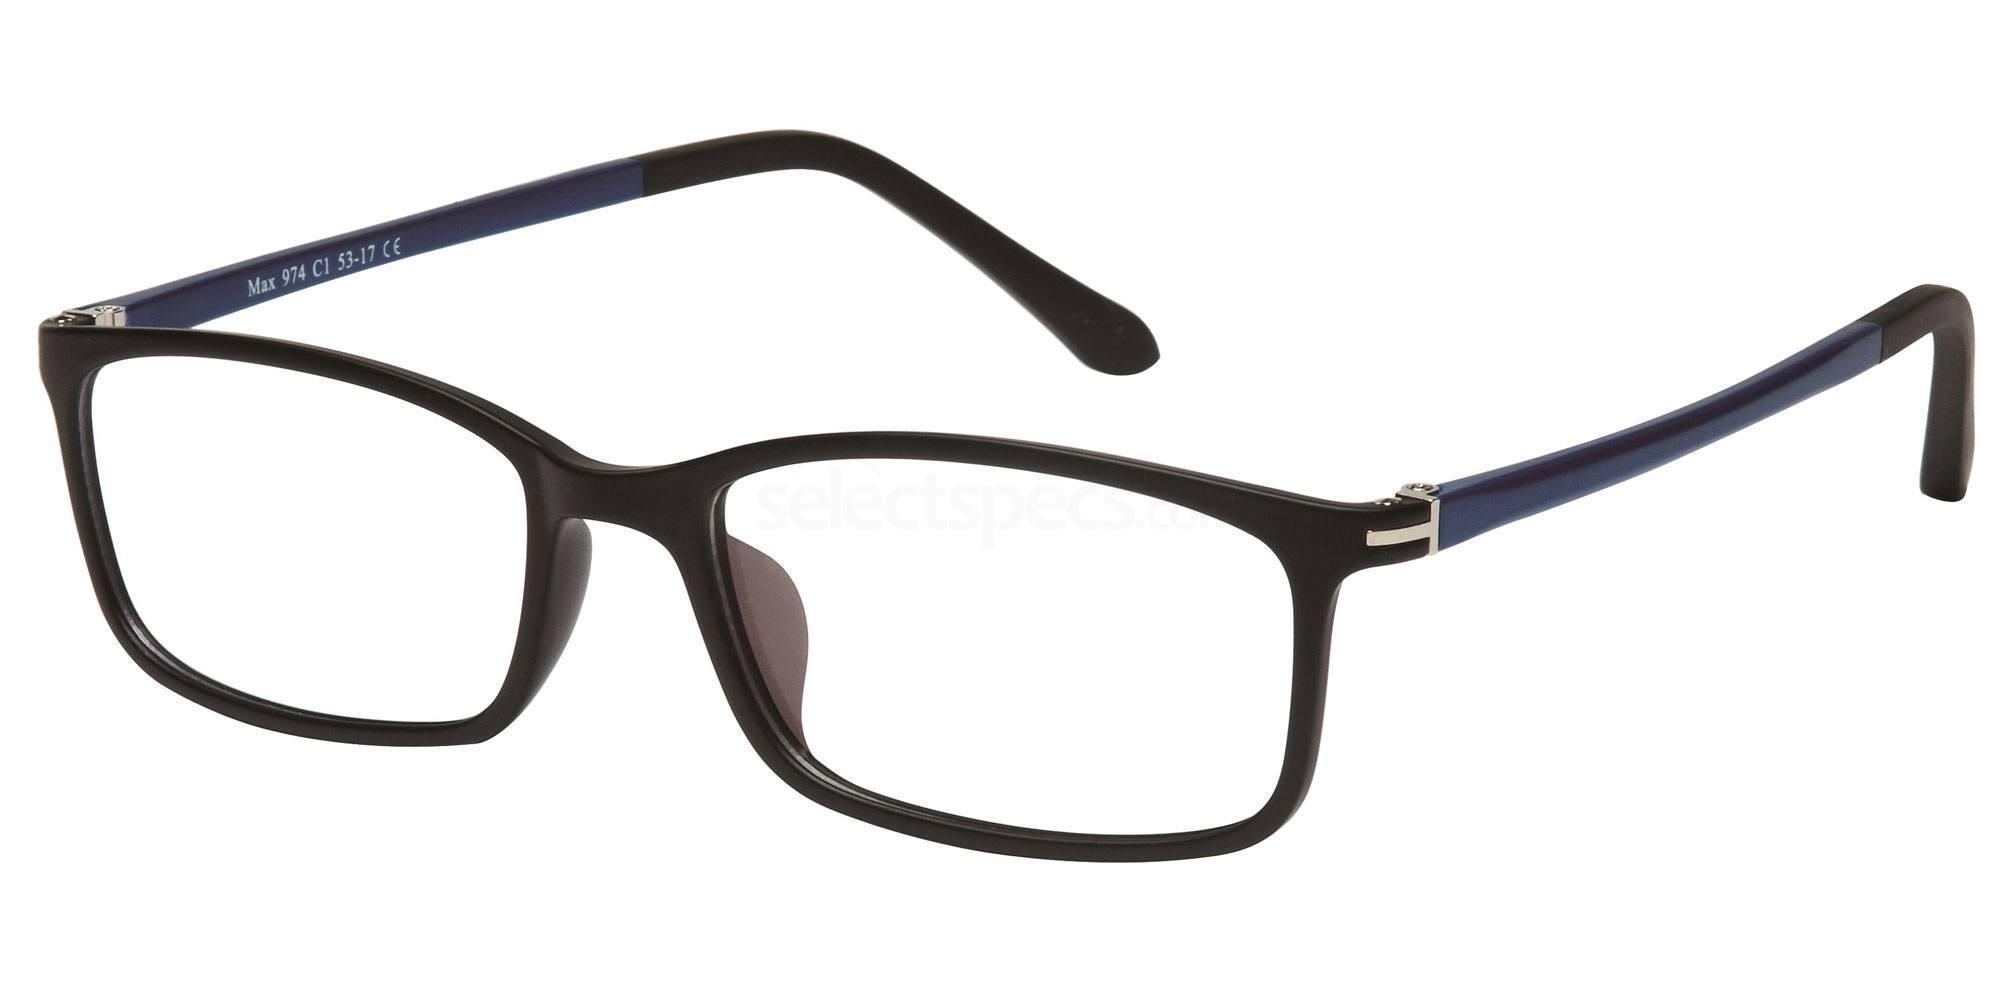 C1 M974 Glasses, Max Eyewear